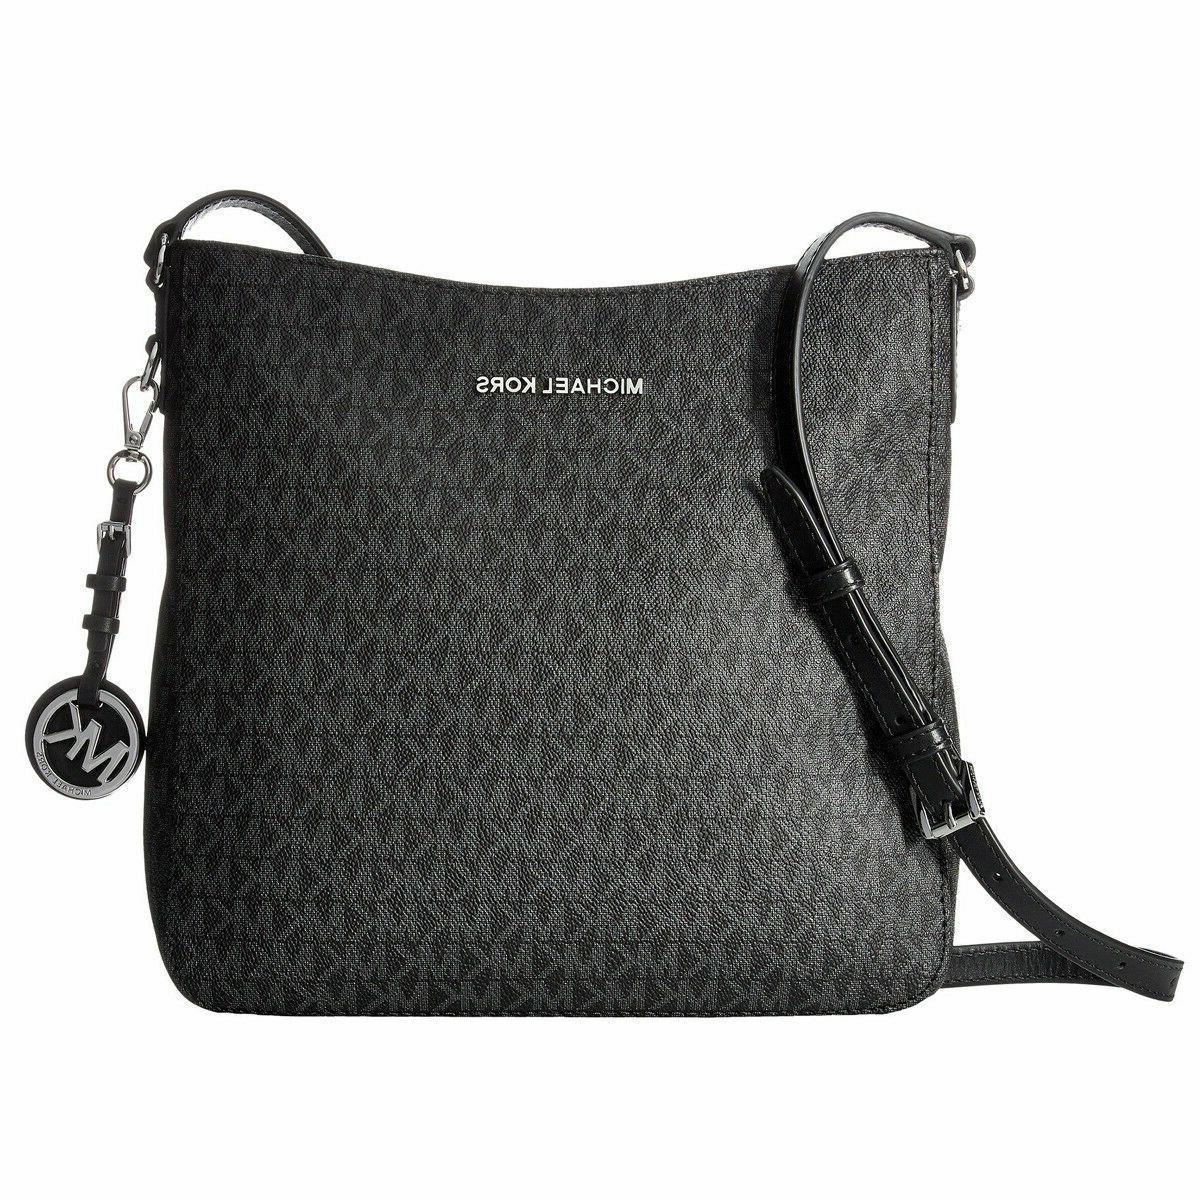 NEW Michael Kors Women's Jet Set Travel Messenger Bag - Blac